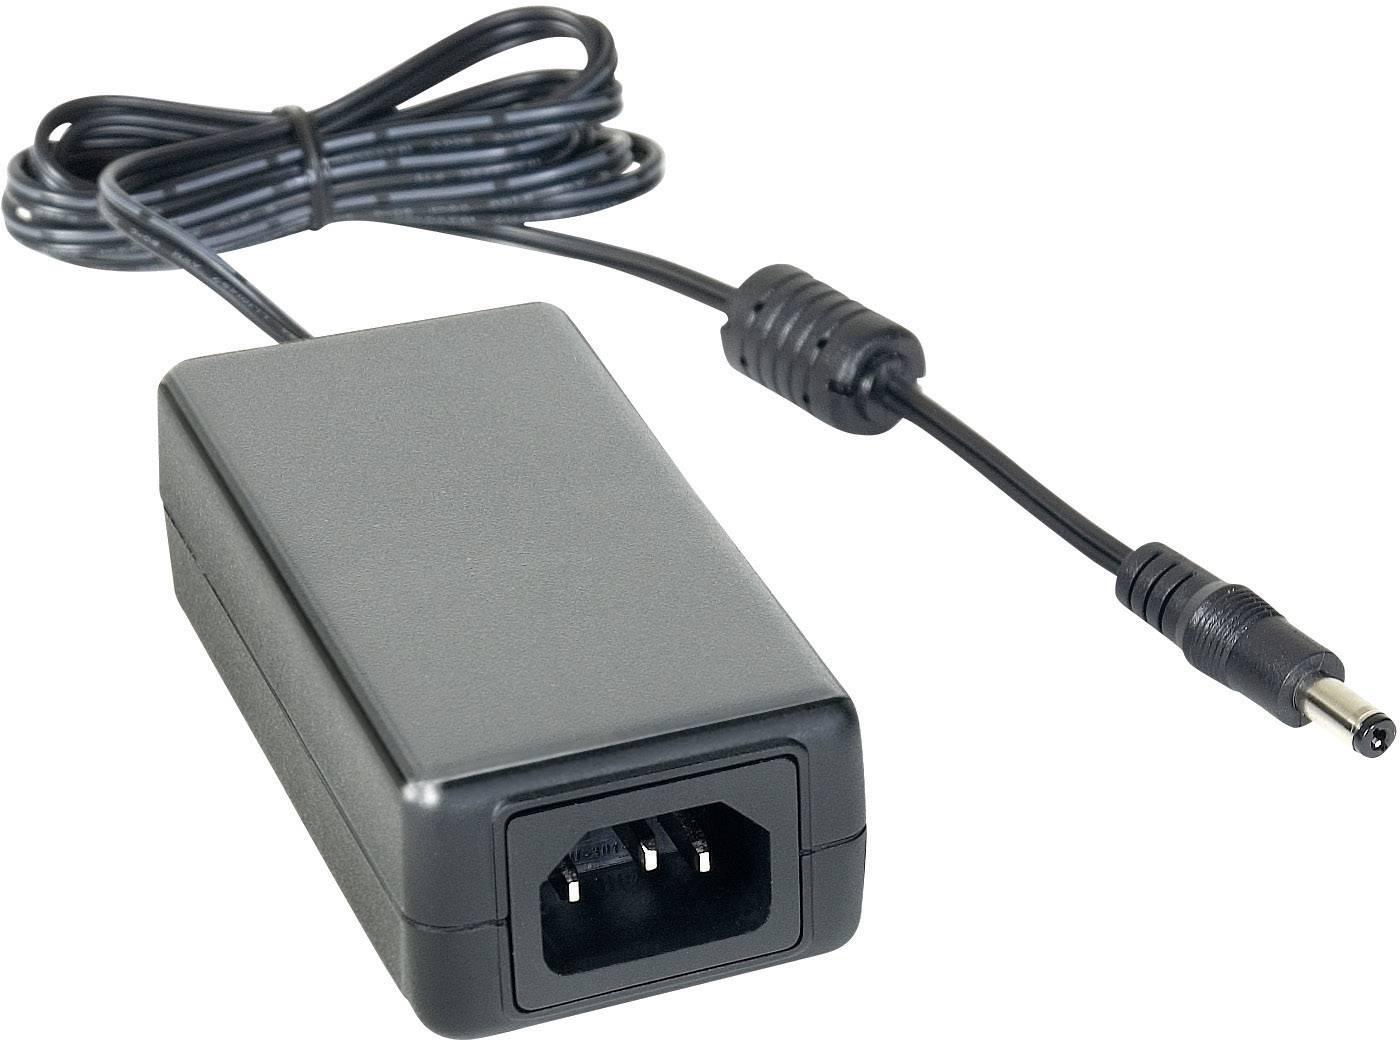 Sieťový adaptér Dehner Elektronik 26497, 24 V/DC, 1,25 A